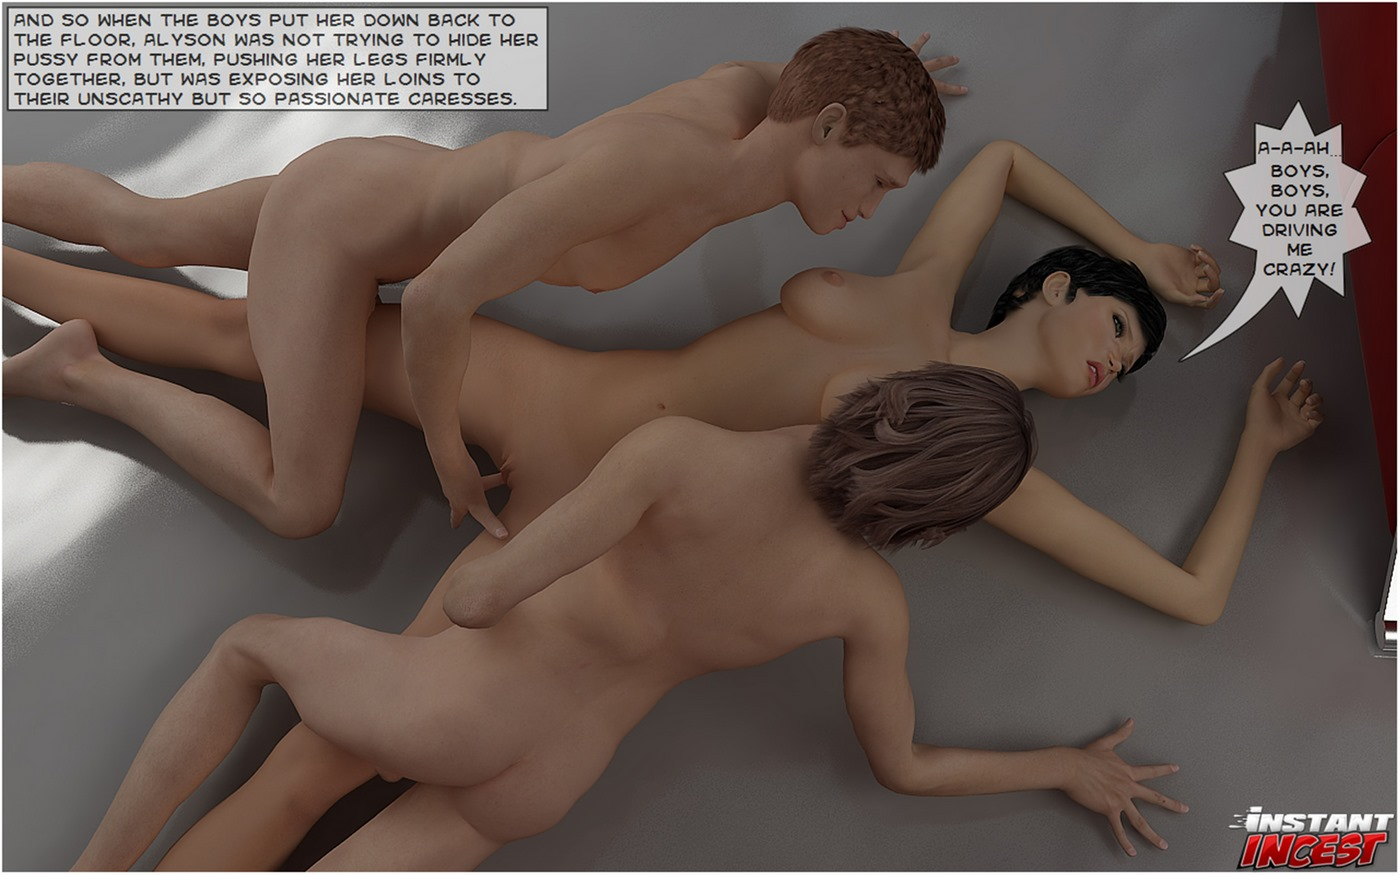 Sons seducing hot momma- Instant Incest - part 2